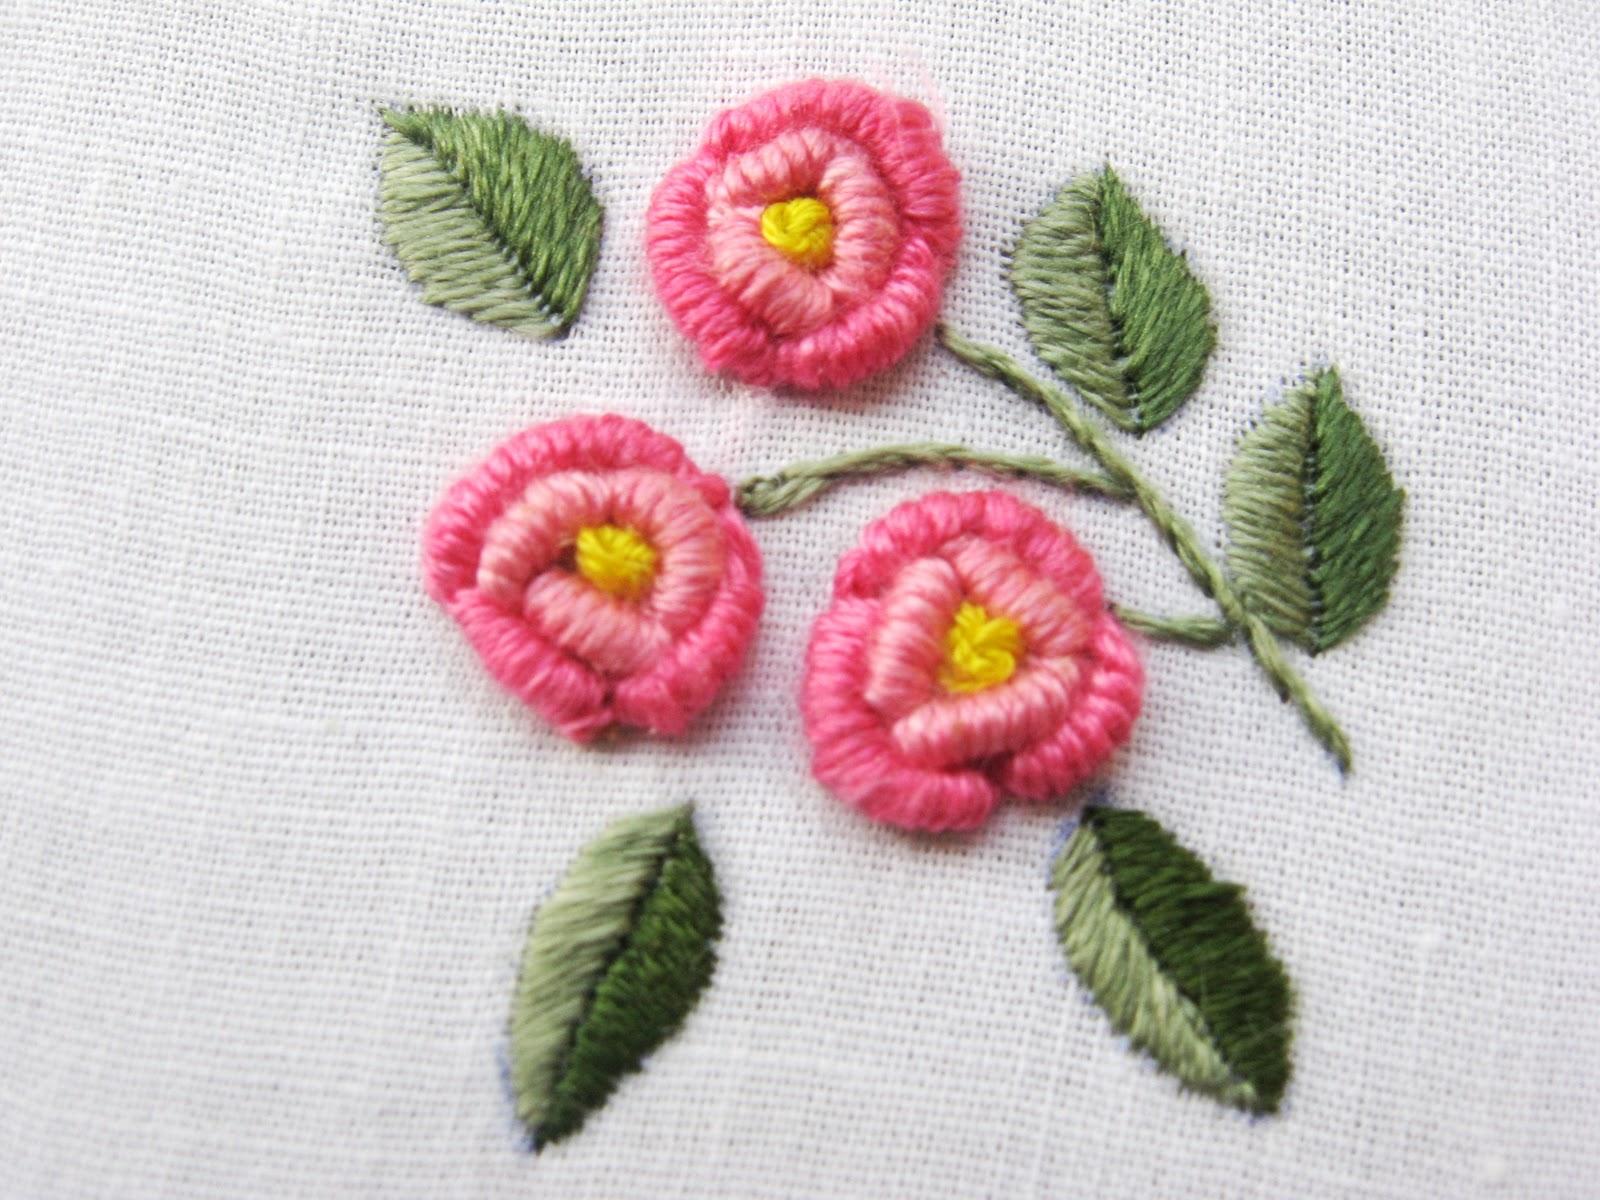 Flora s colors bullion roses